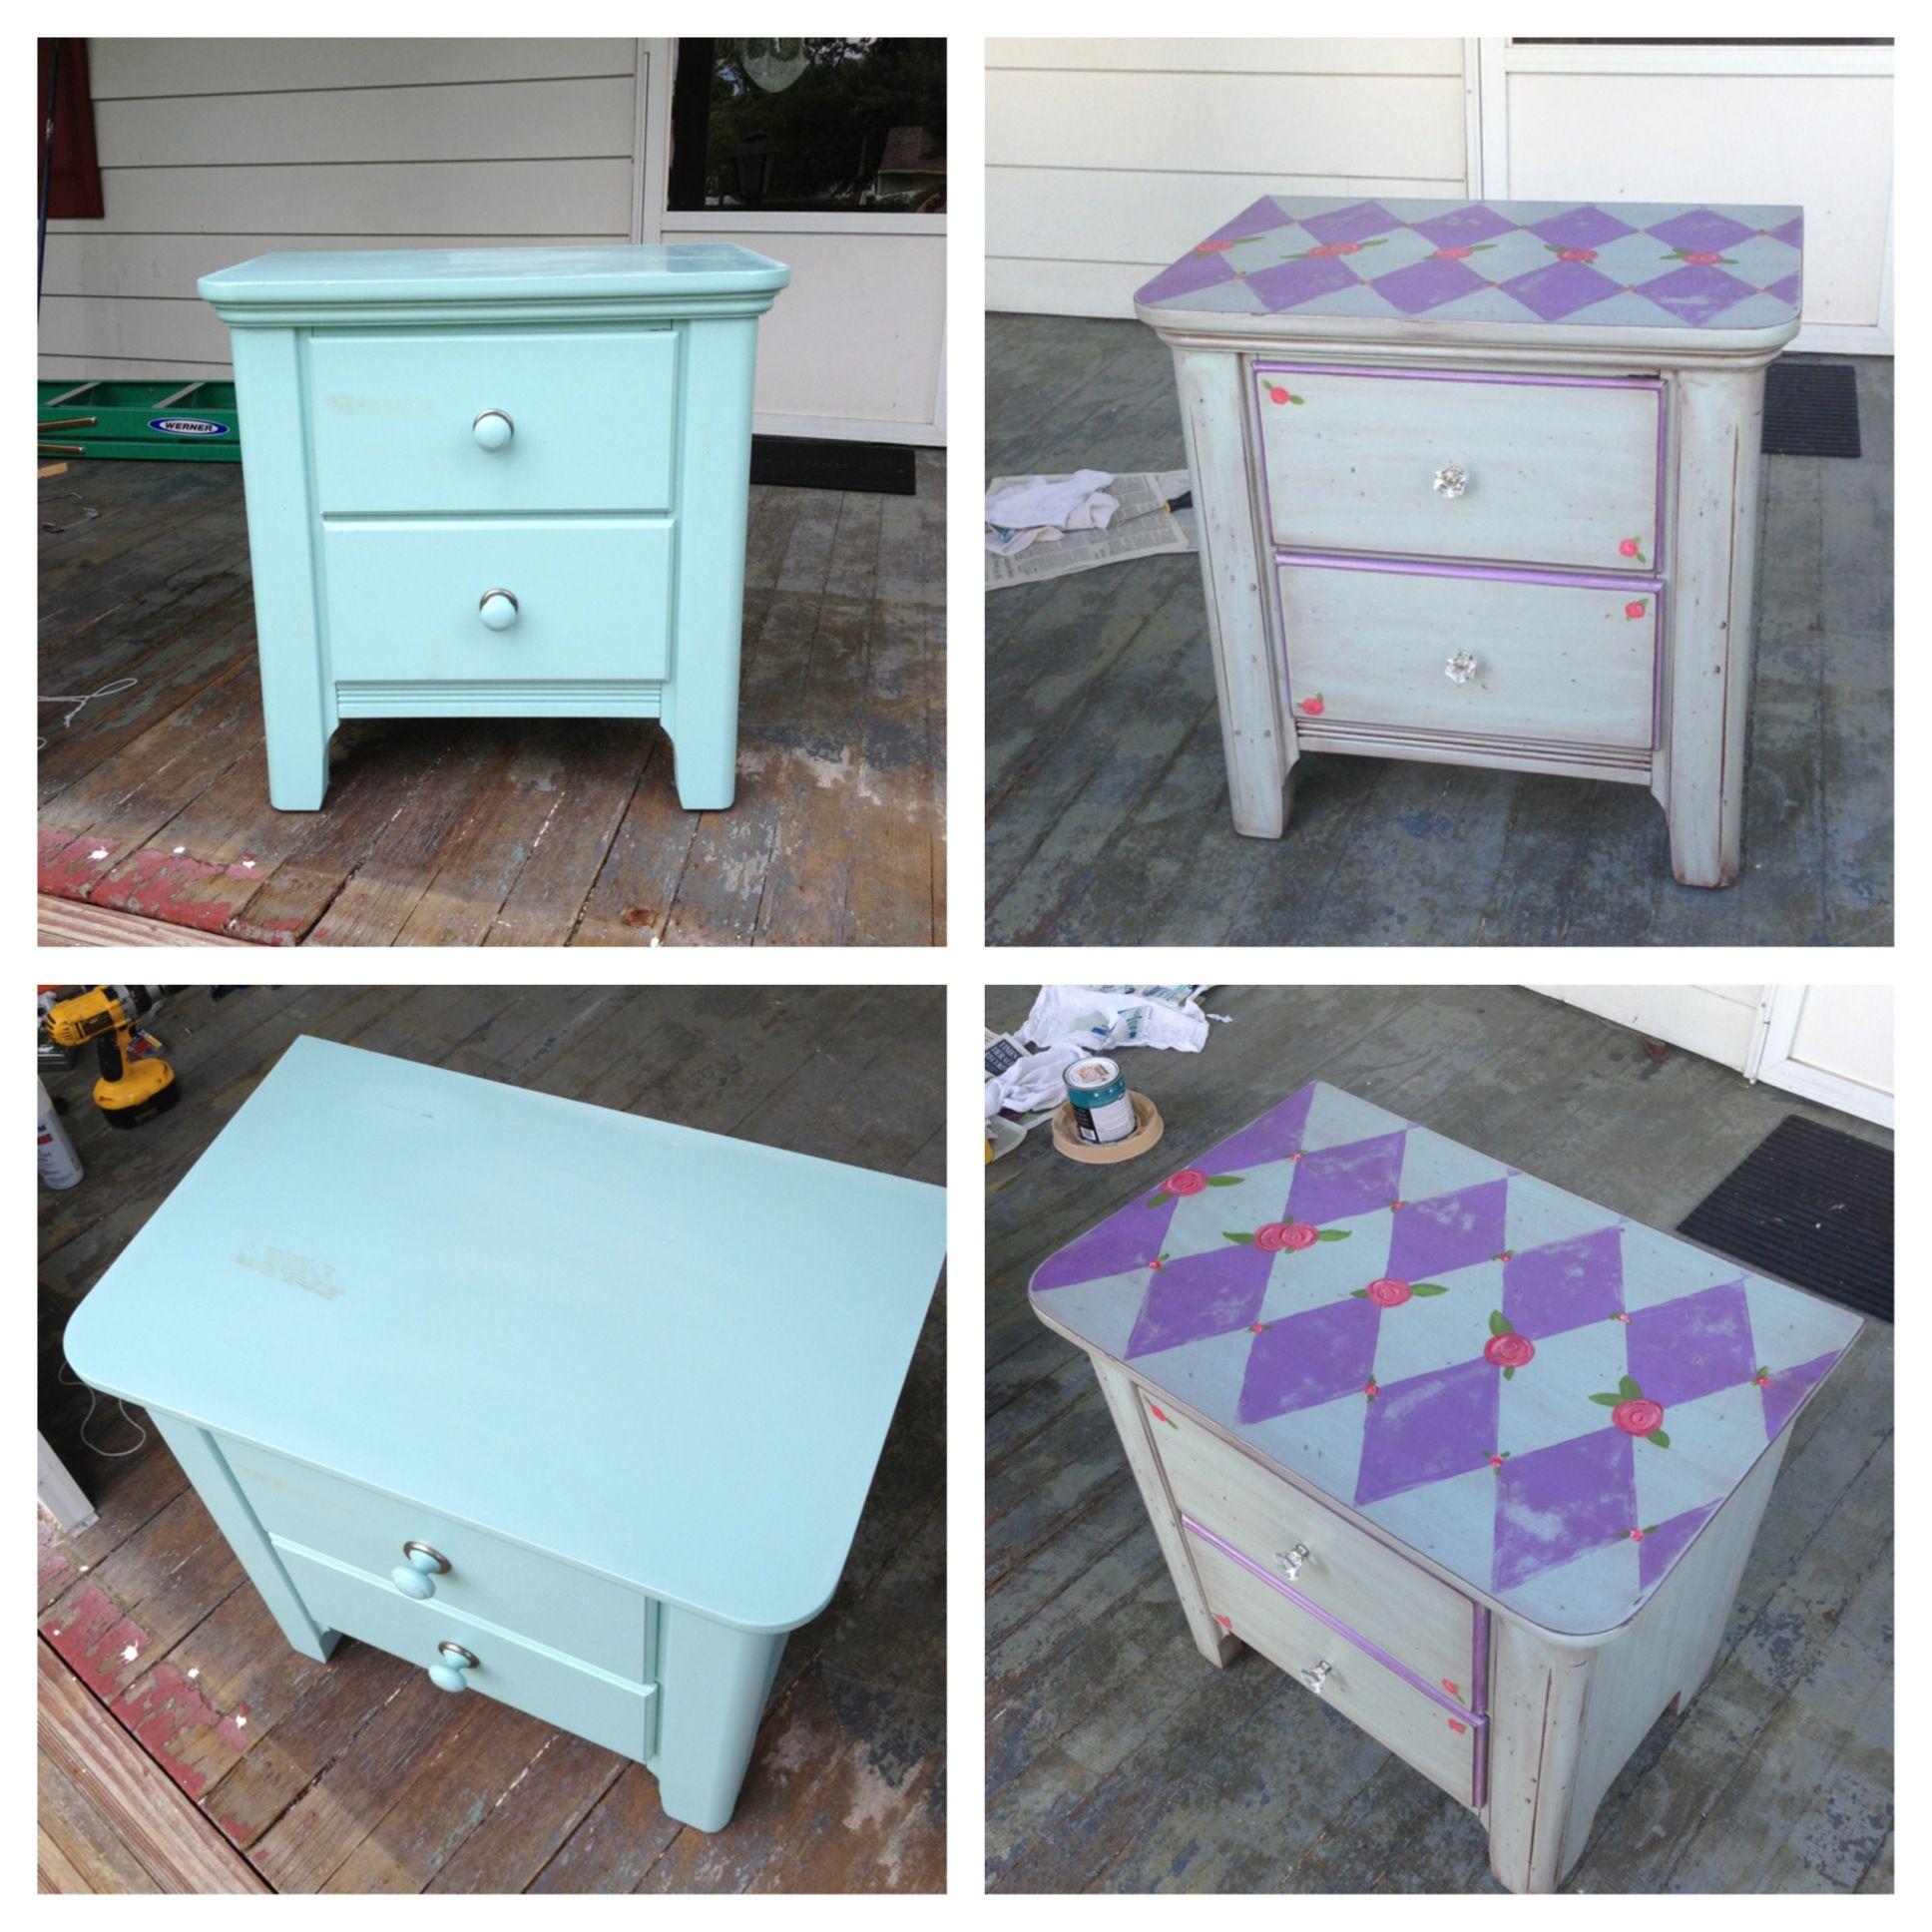 Diy nightstand diy pinterest diy nightstand for Homemade nightstand ideas